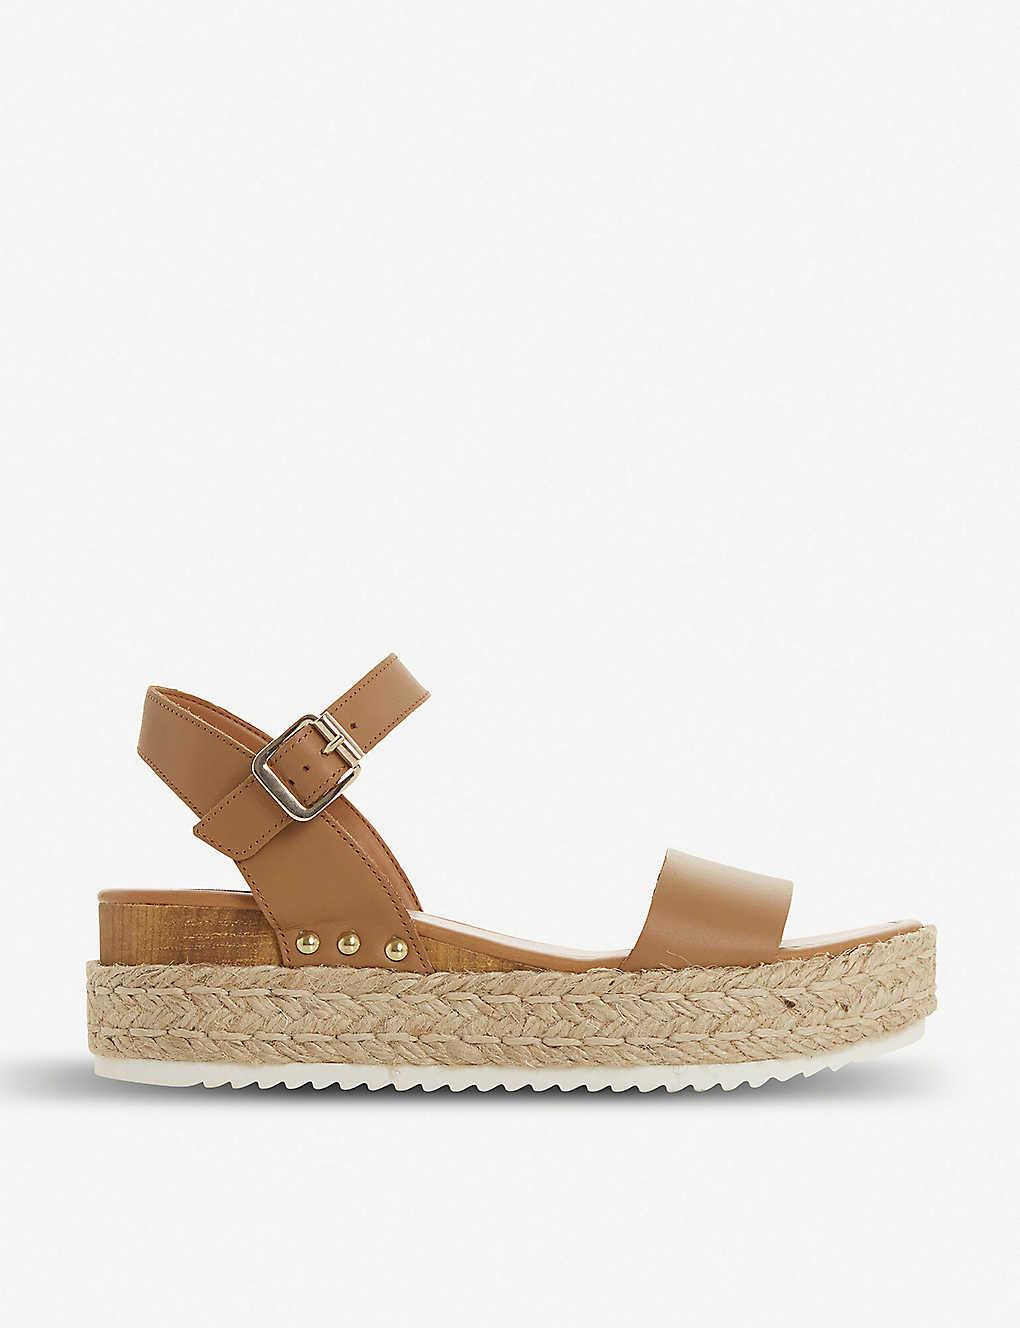 07f038dc8e STEVE MADDEN - Chiara leather flatform sandals   Selfridges.com